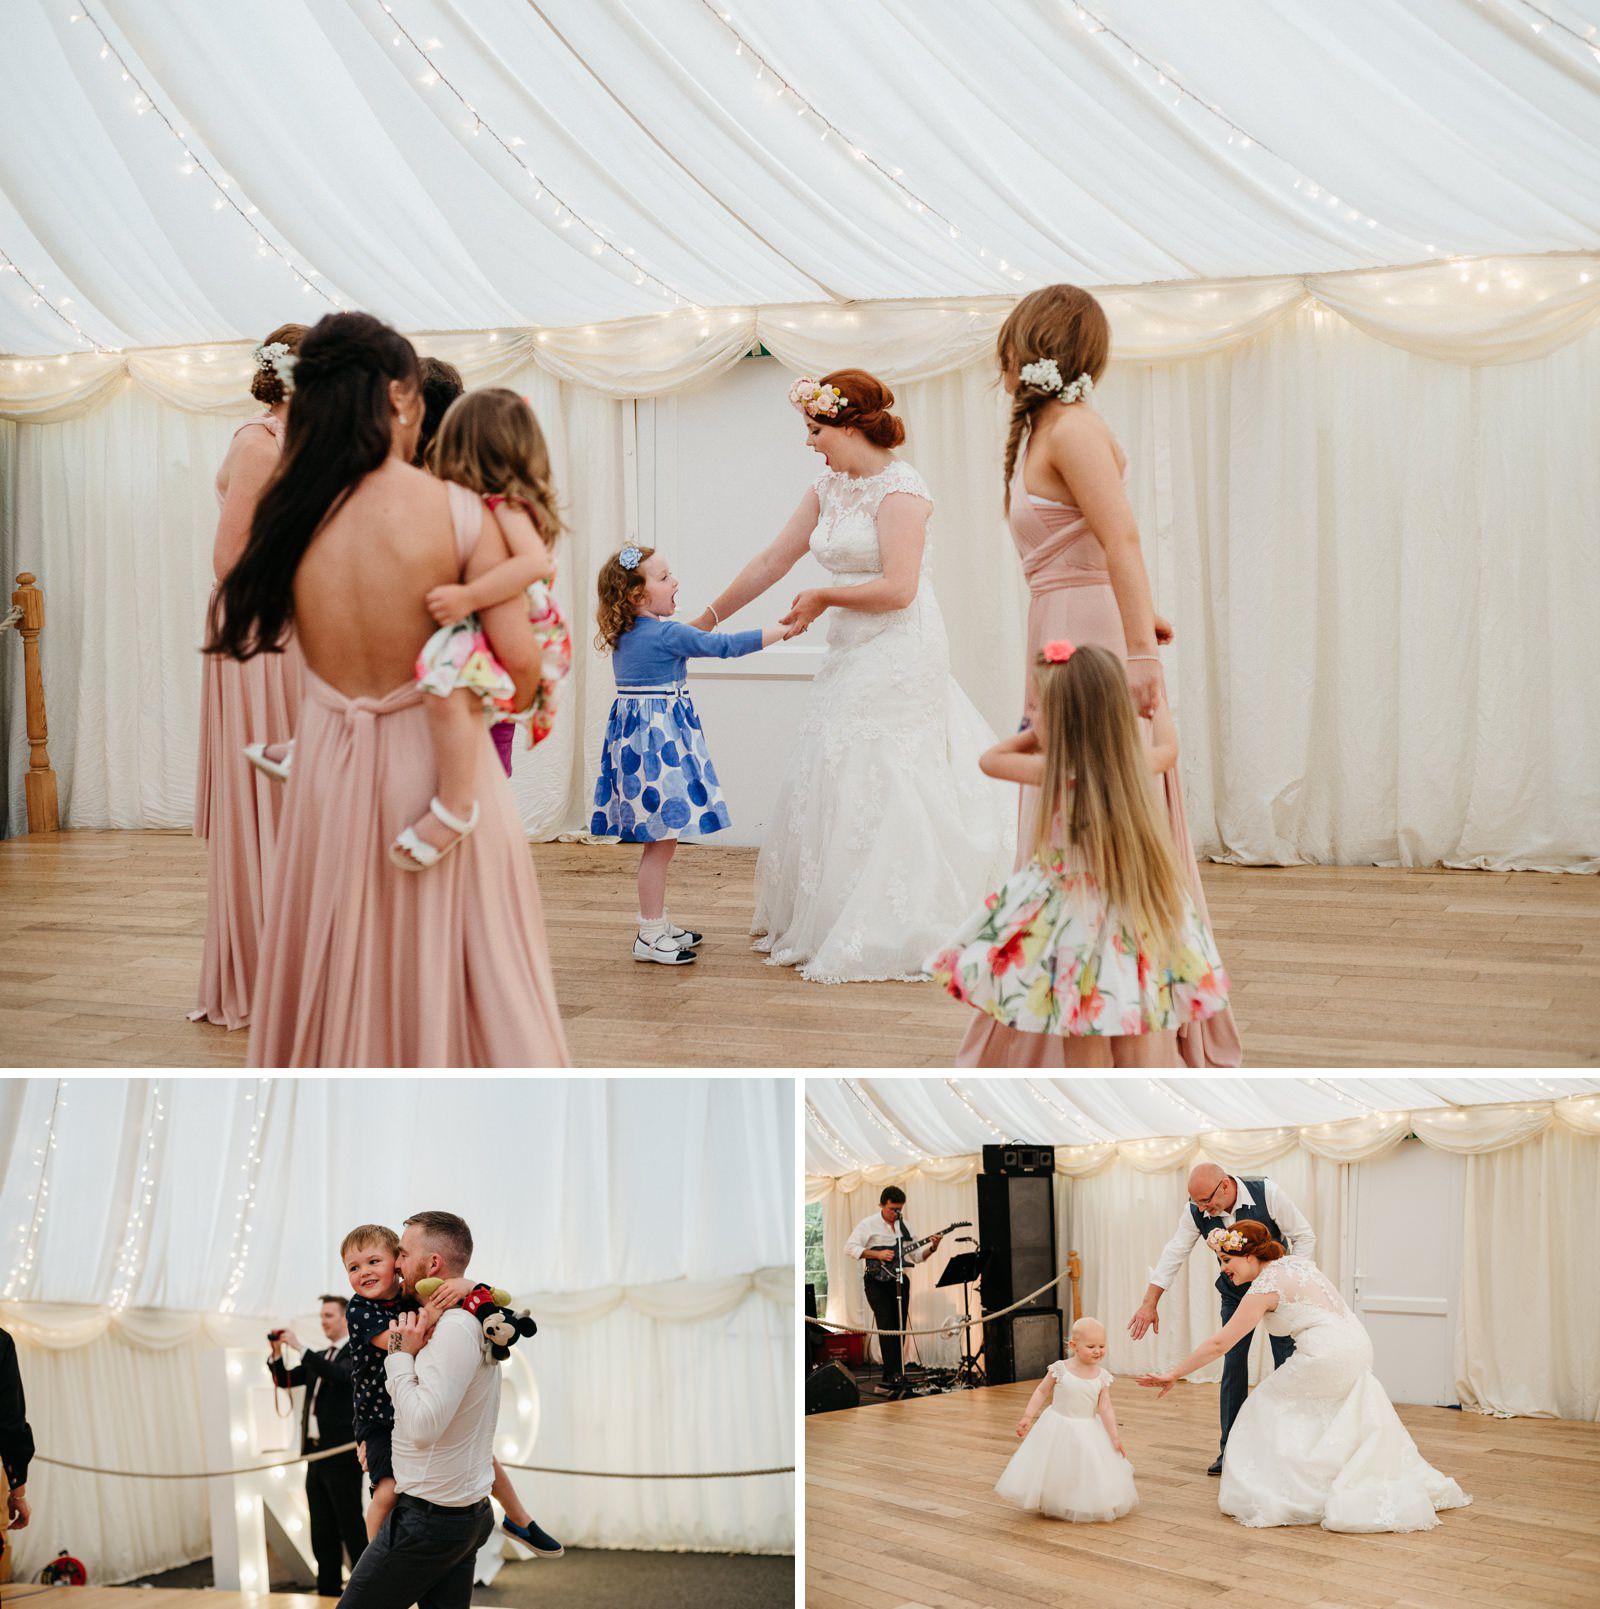 bride and ger bridesmaids dancing